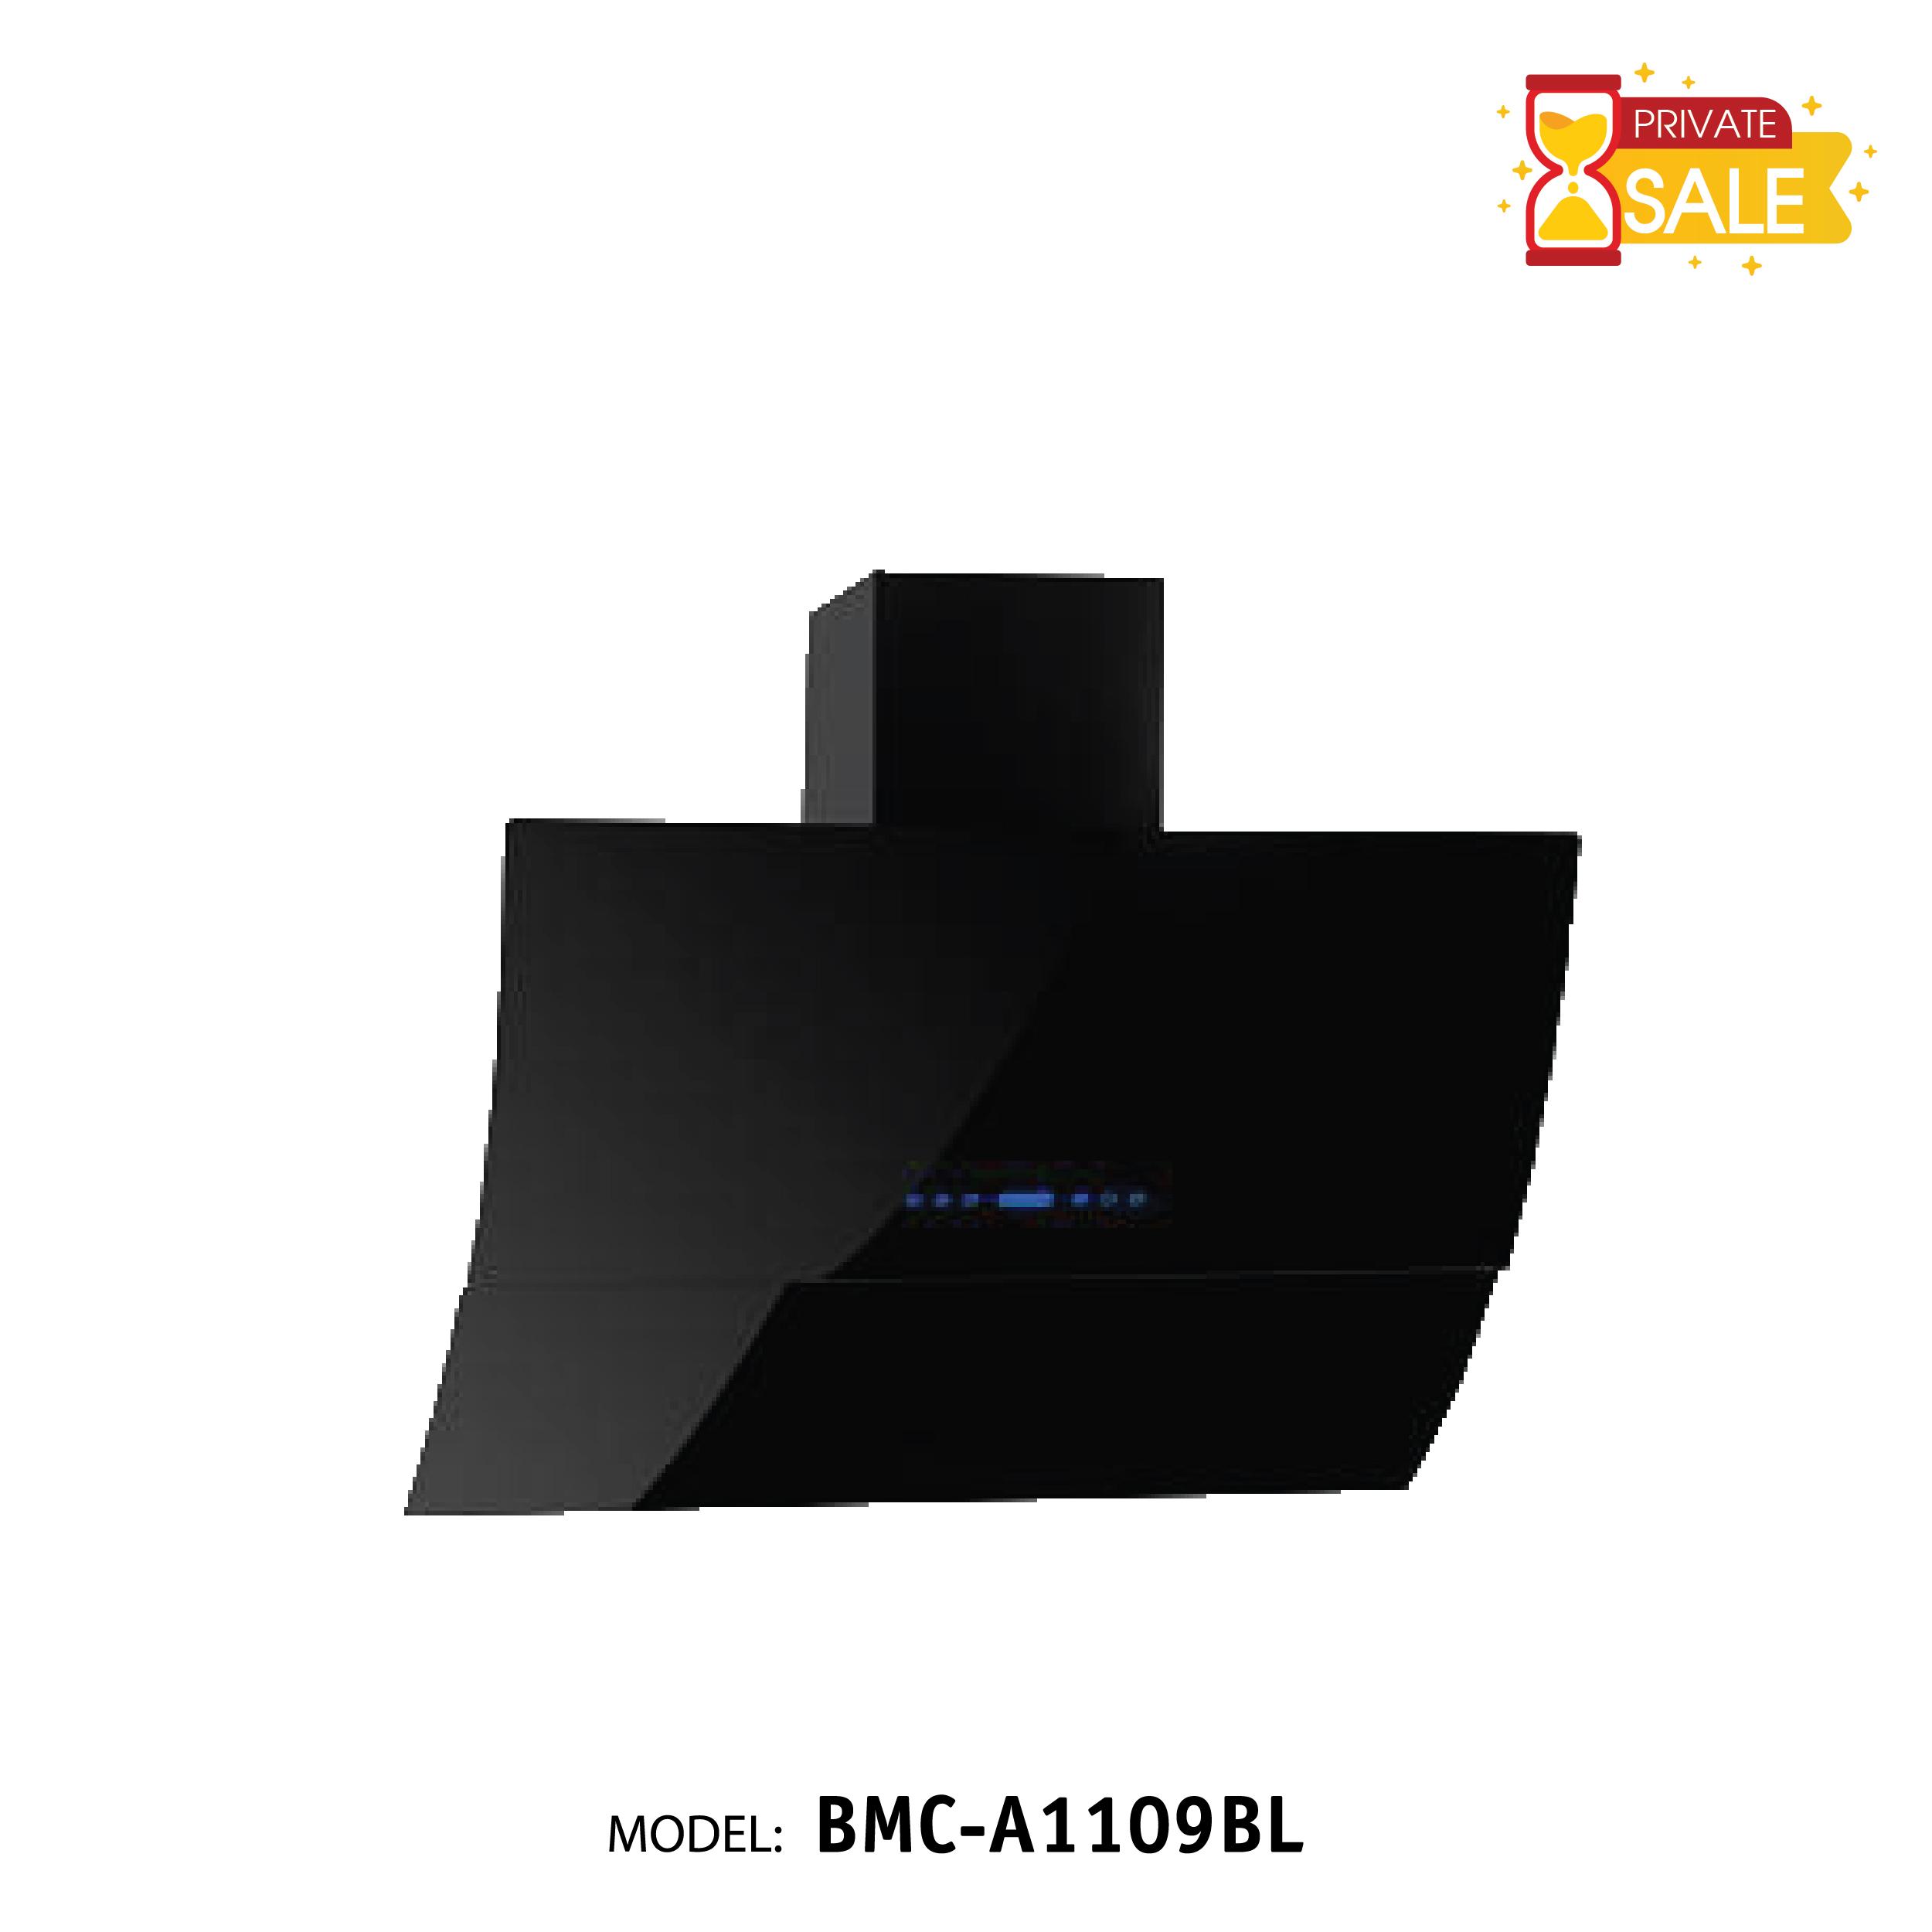 Máy hút mùi áp tường Birillo - Model BMCA1109BL